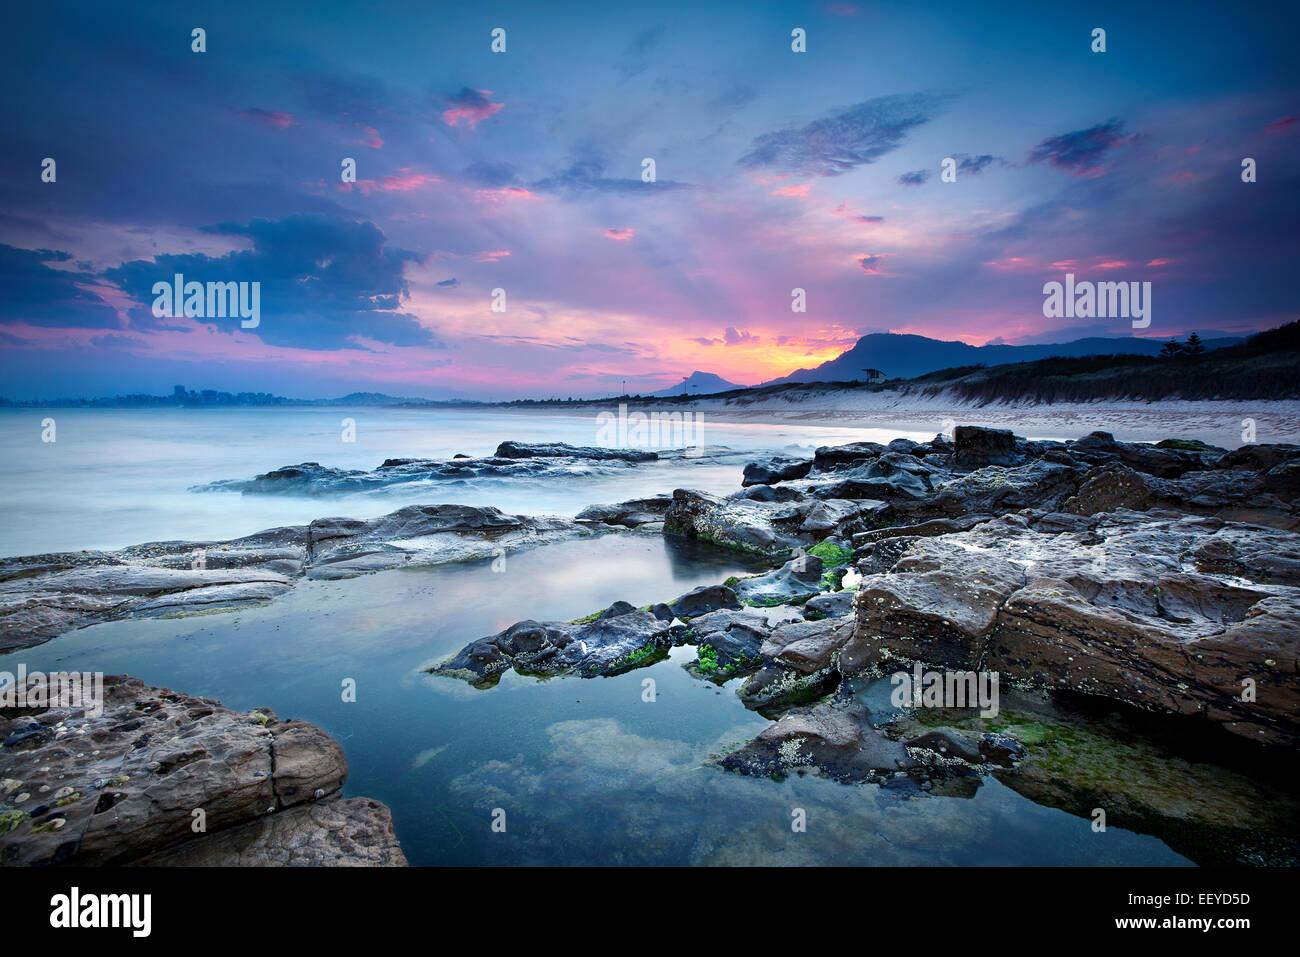 Seascape australiano Imagen De Stock